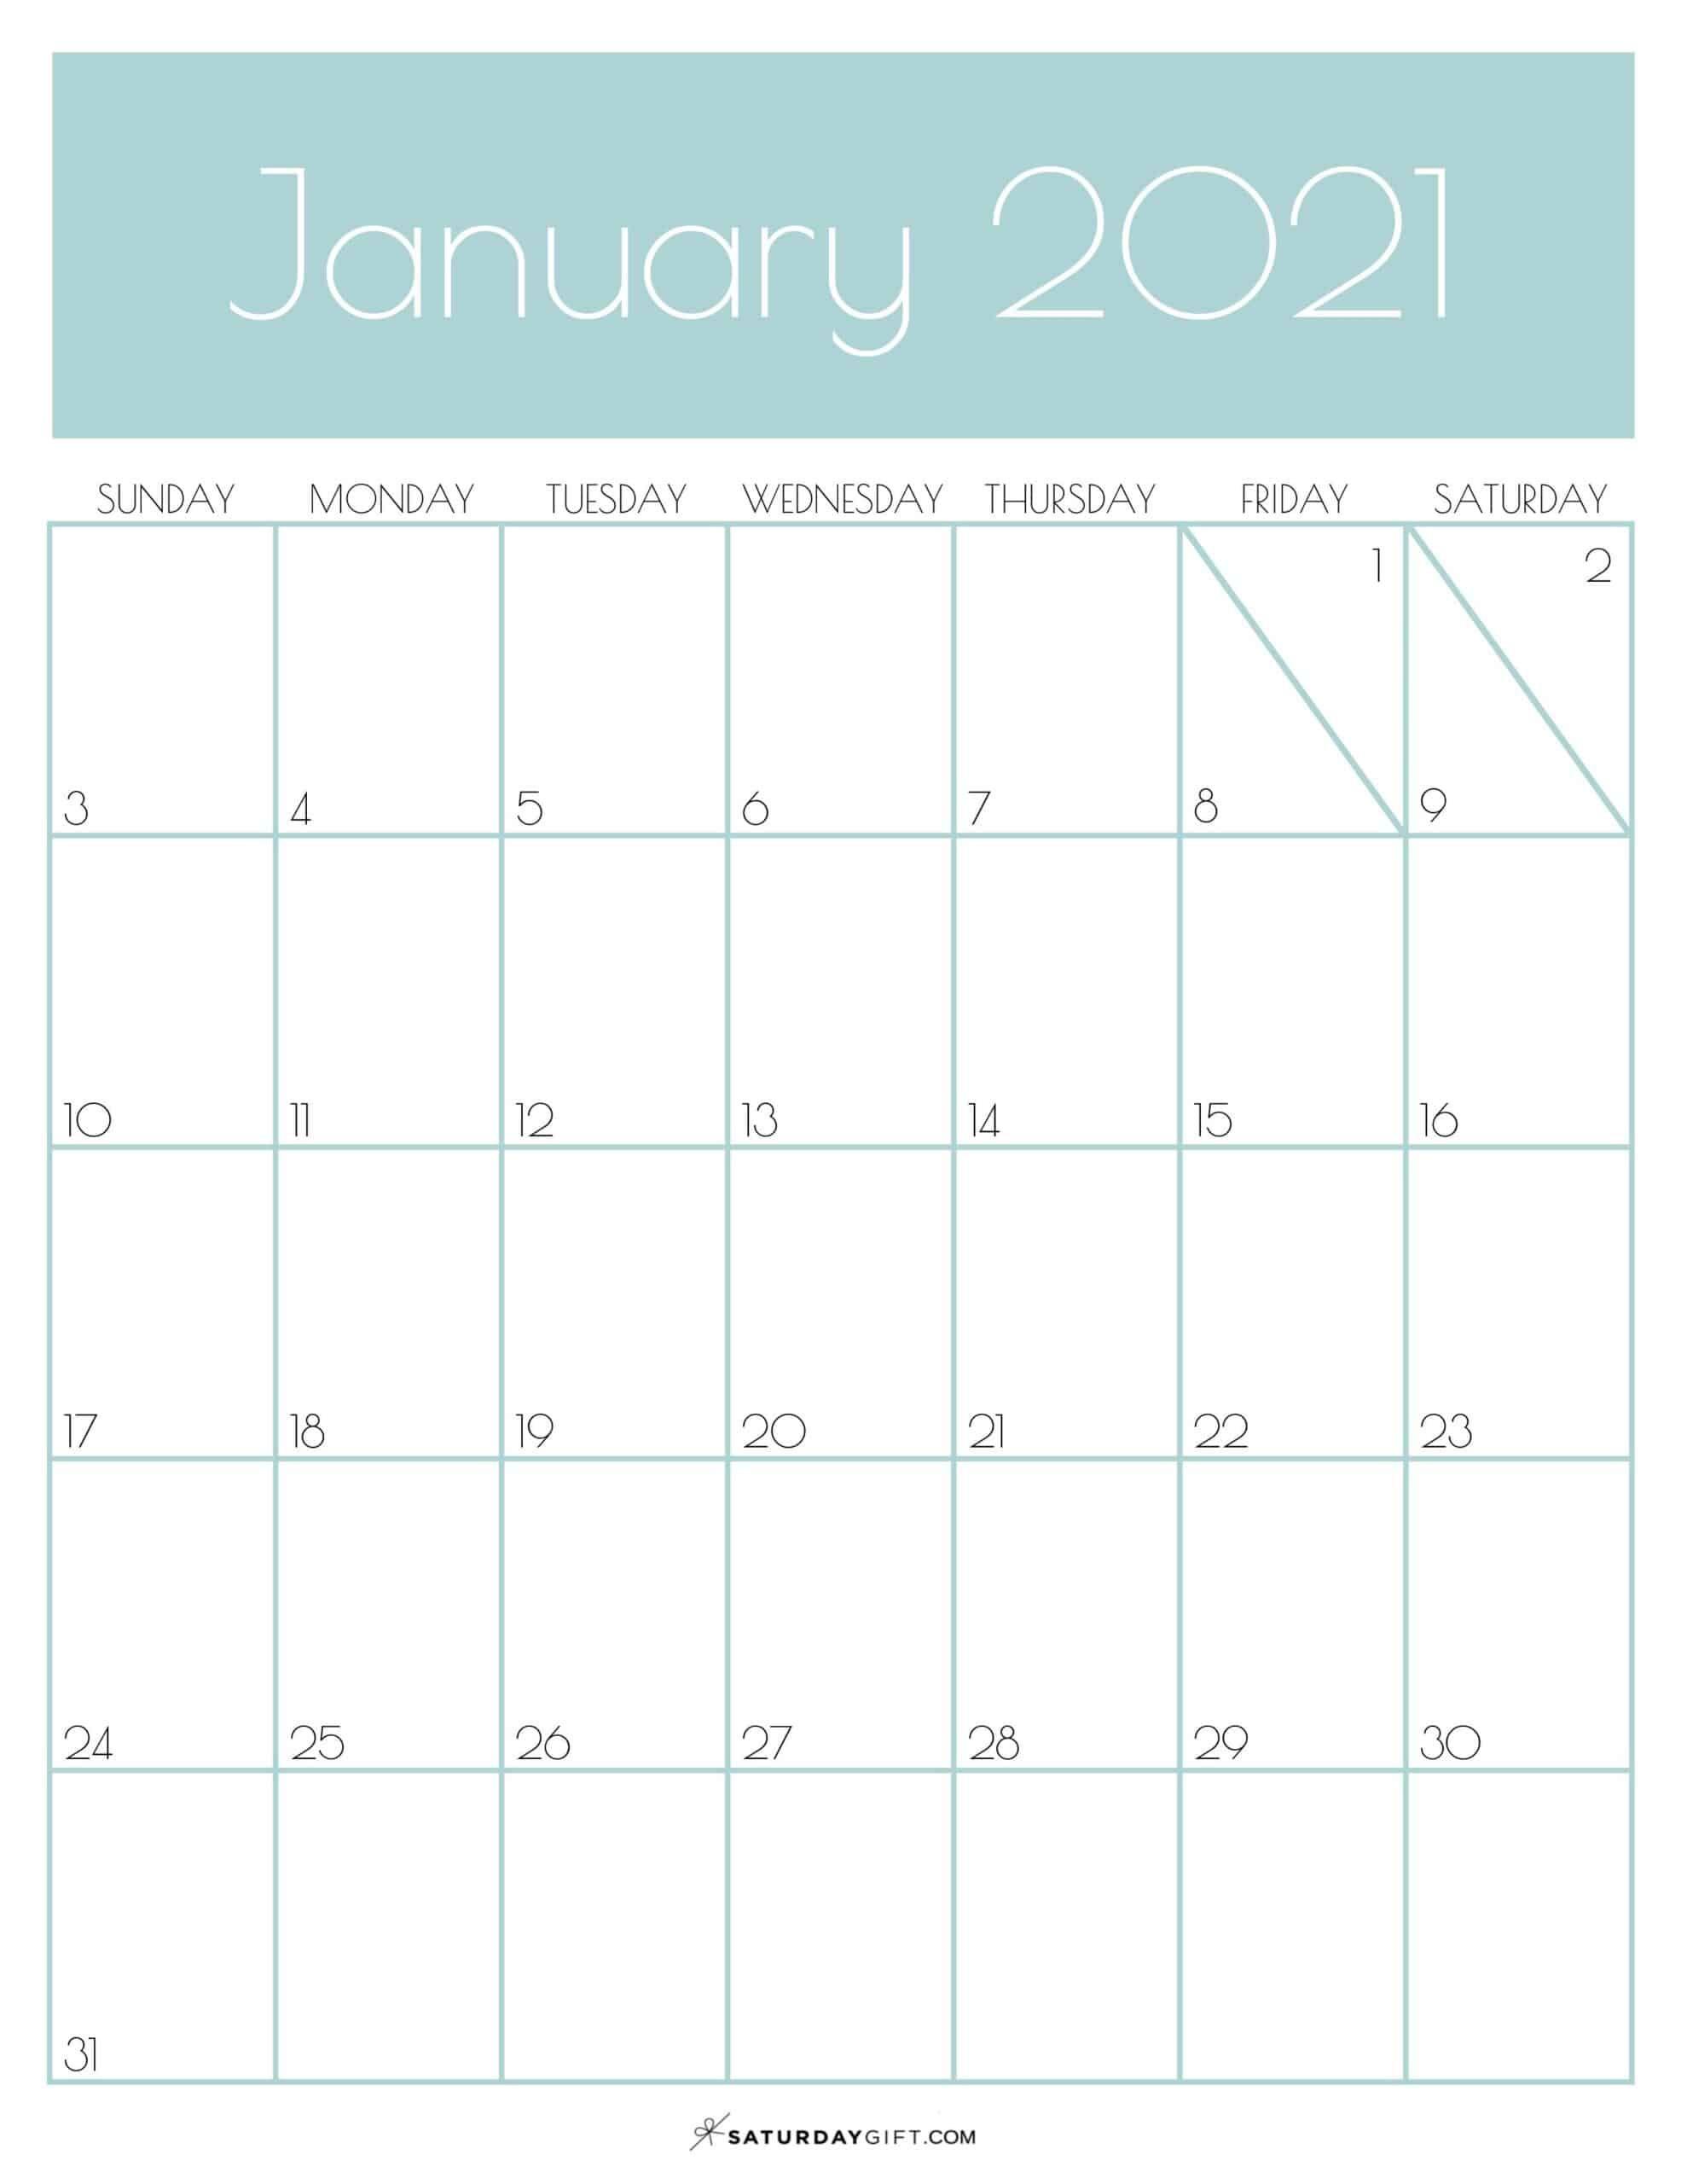 Cute Free Printable January 2021 Calendar Saturdaygift In 2020 Calendar Printables Calendar Template 2021 Calendar